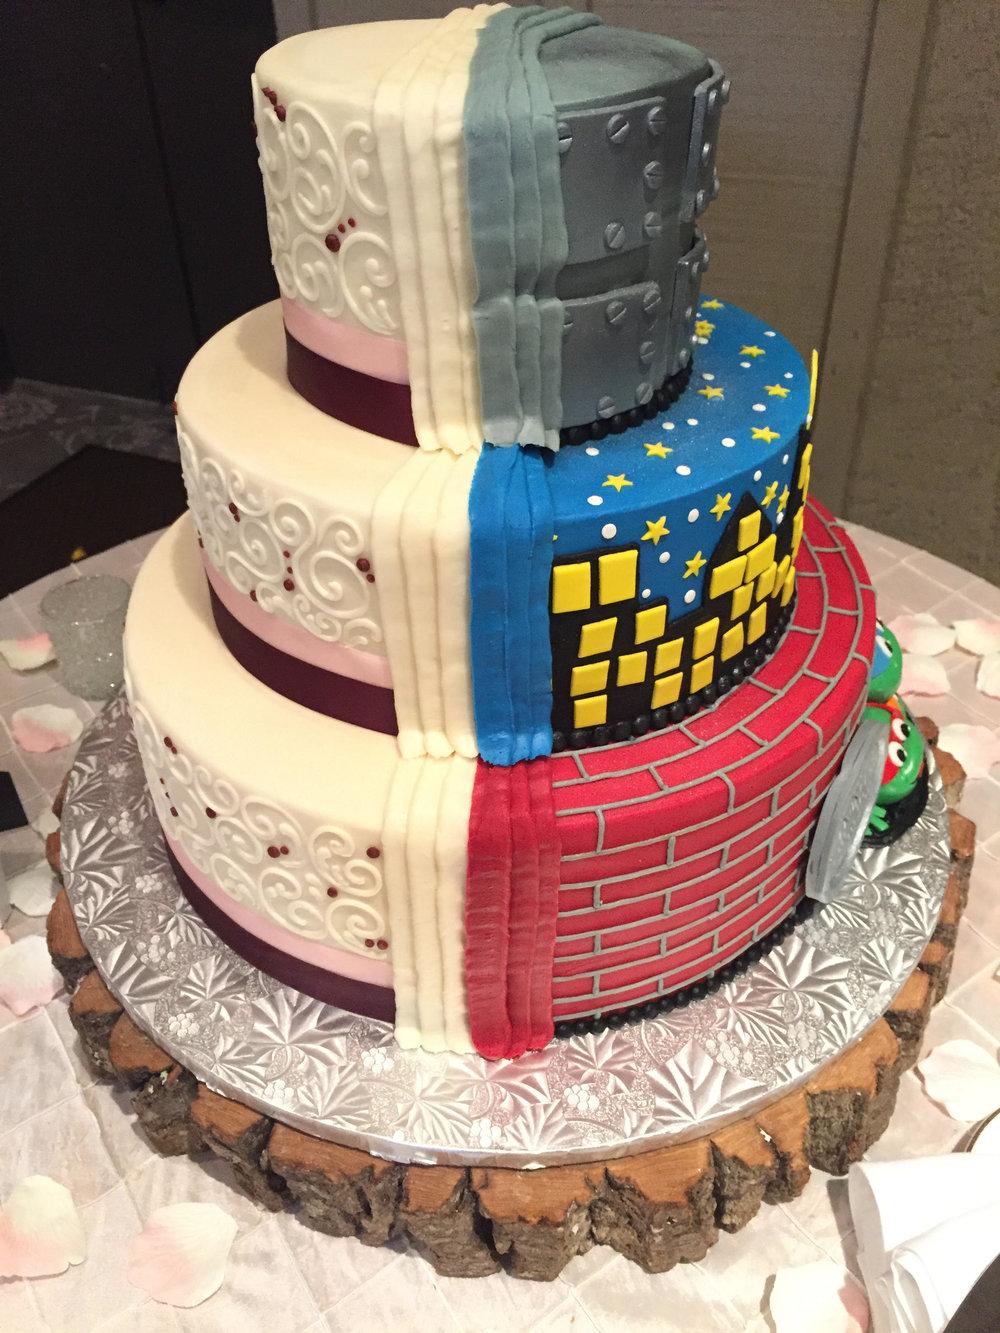 Ninja Turtles and Scroll Work for a Wedding Cake